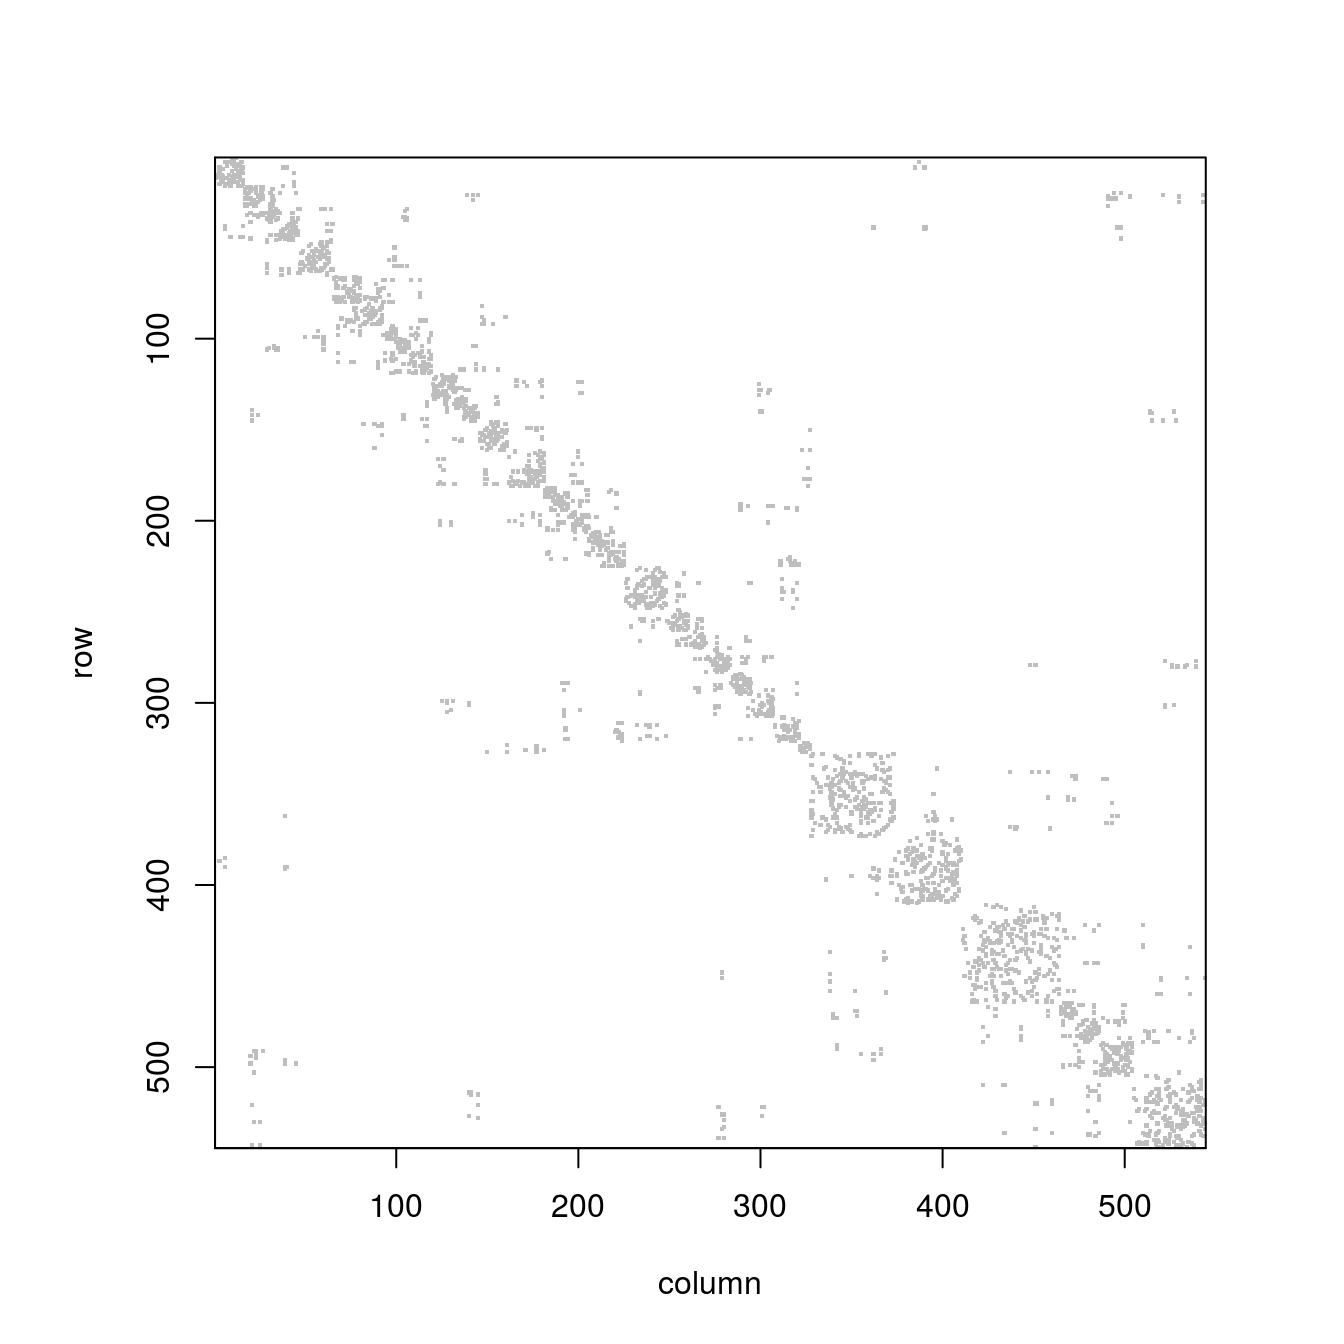 public/index_files/figure-html/sparsematrix-1.png